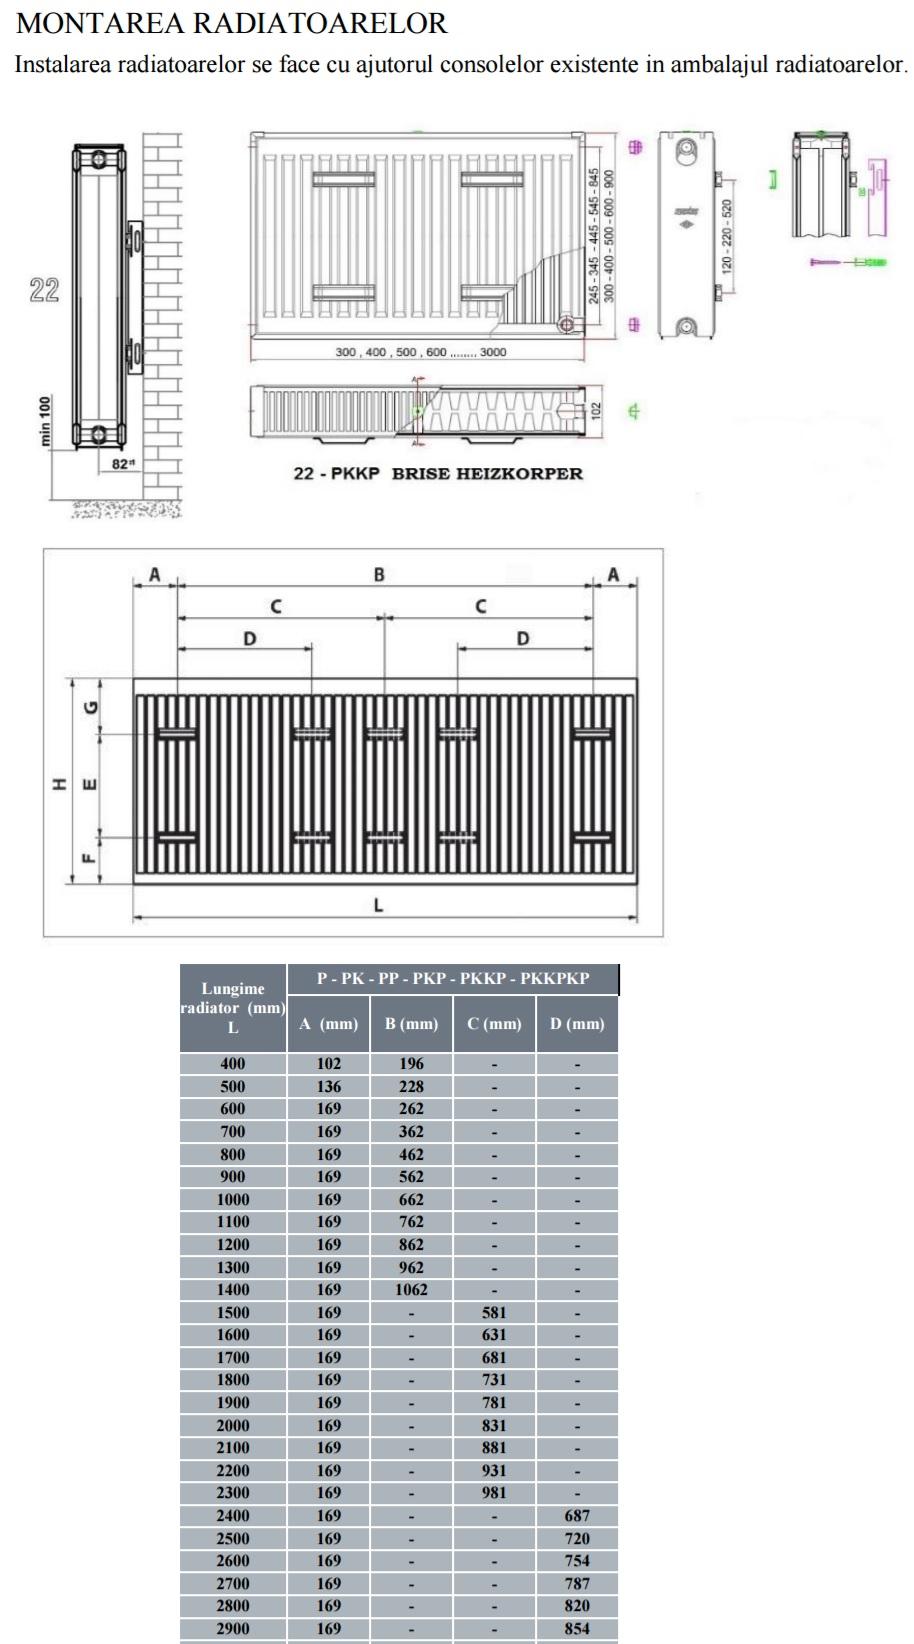 680af1b2c7a6e5ade0ece6aea645858f-1496093